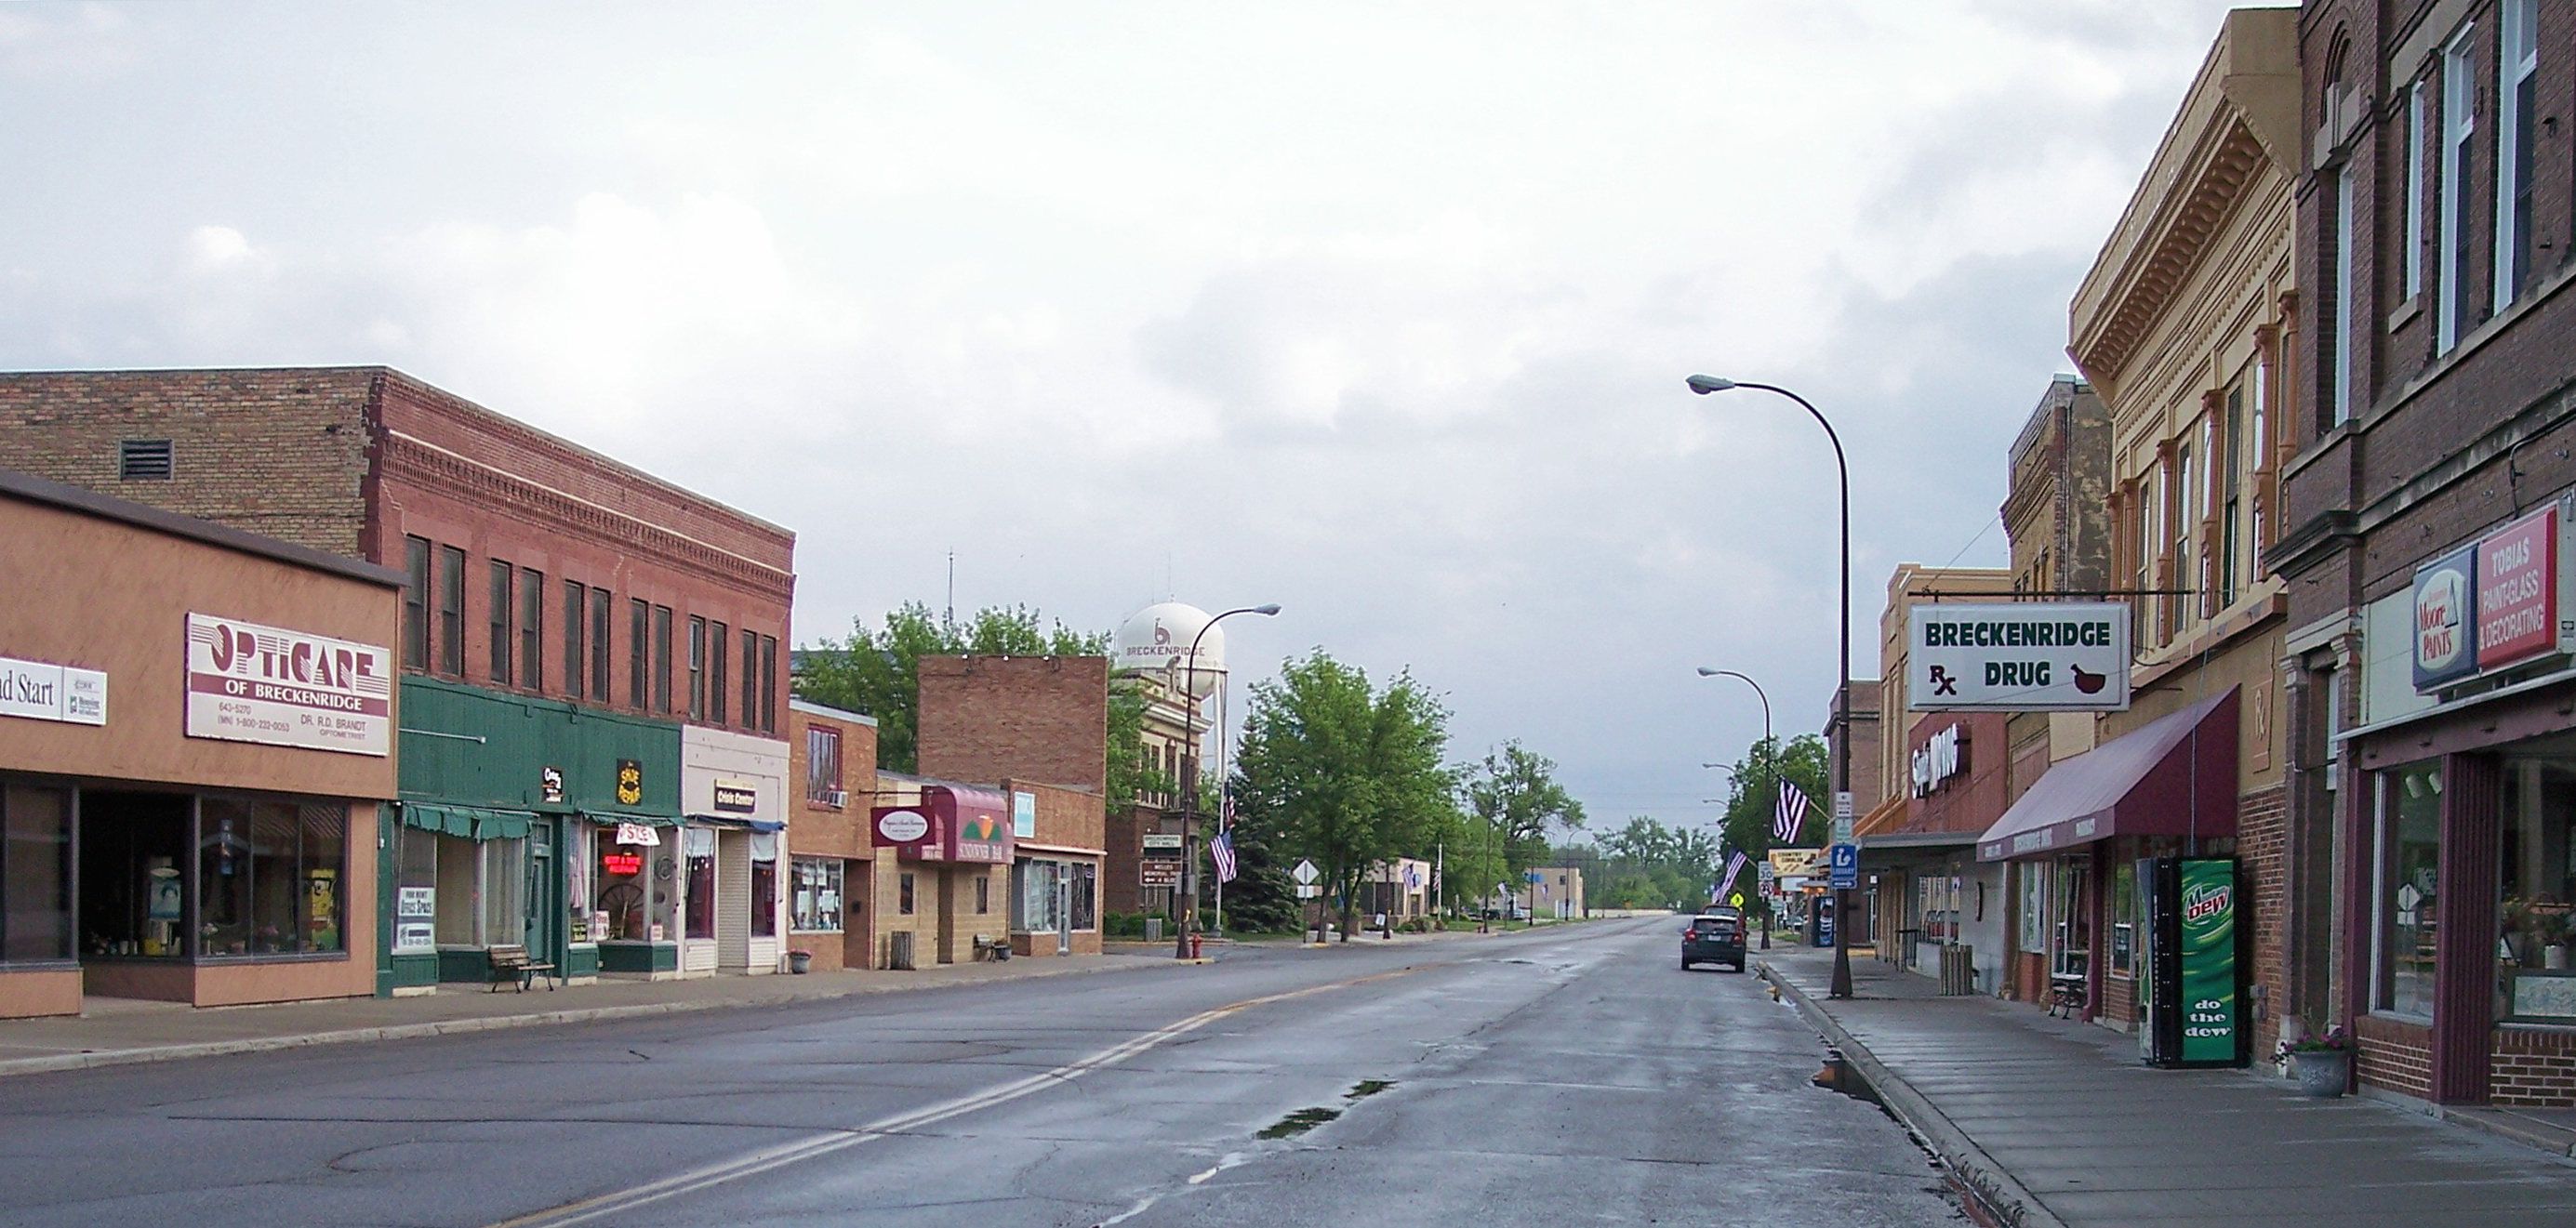 Breckenridge (Minnesota) #